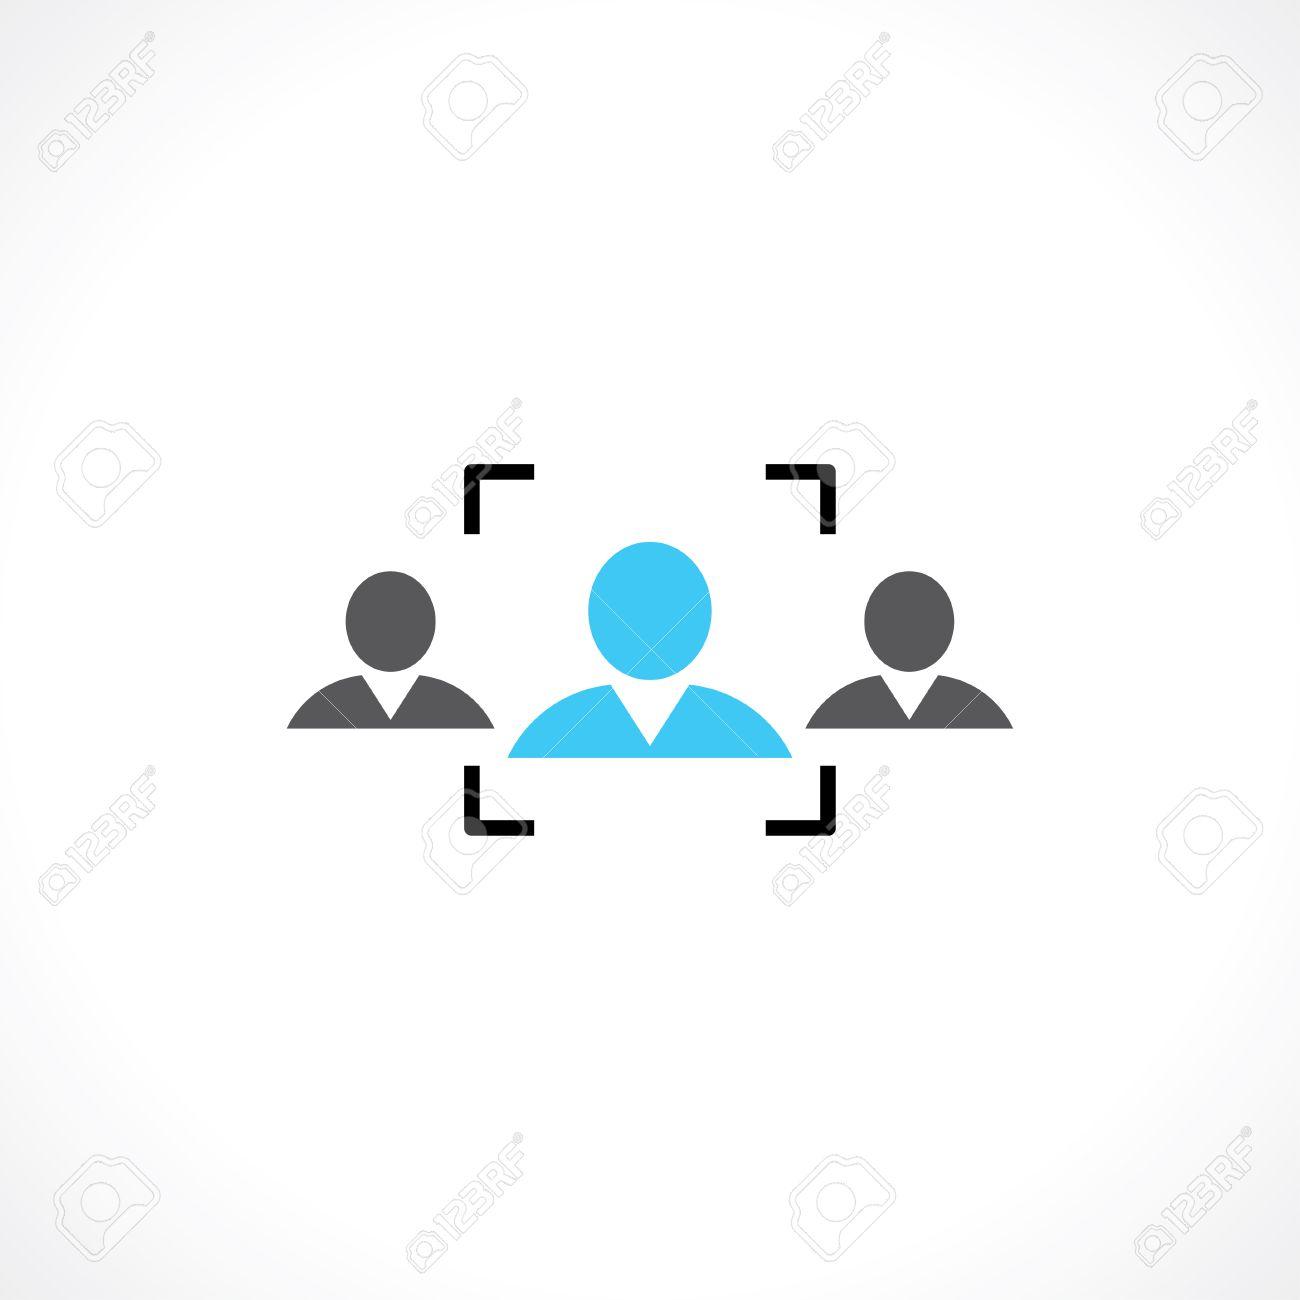 symbol of recruitment people - 37043689